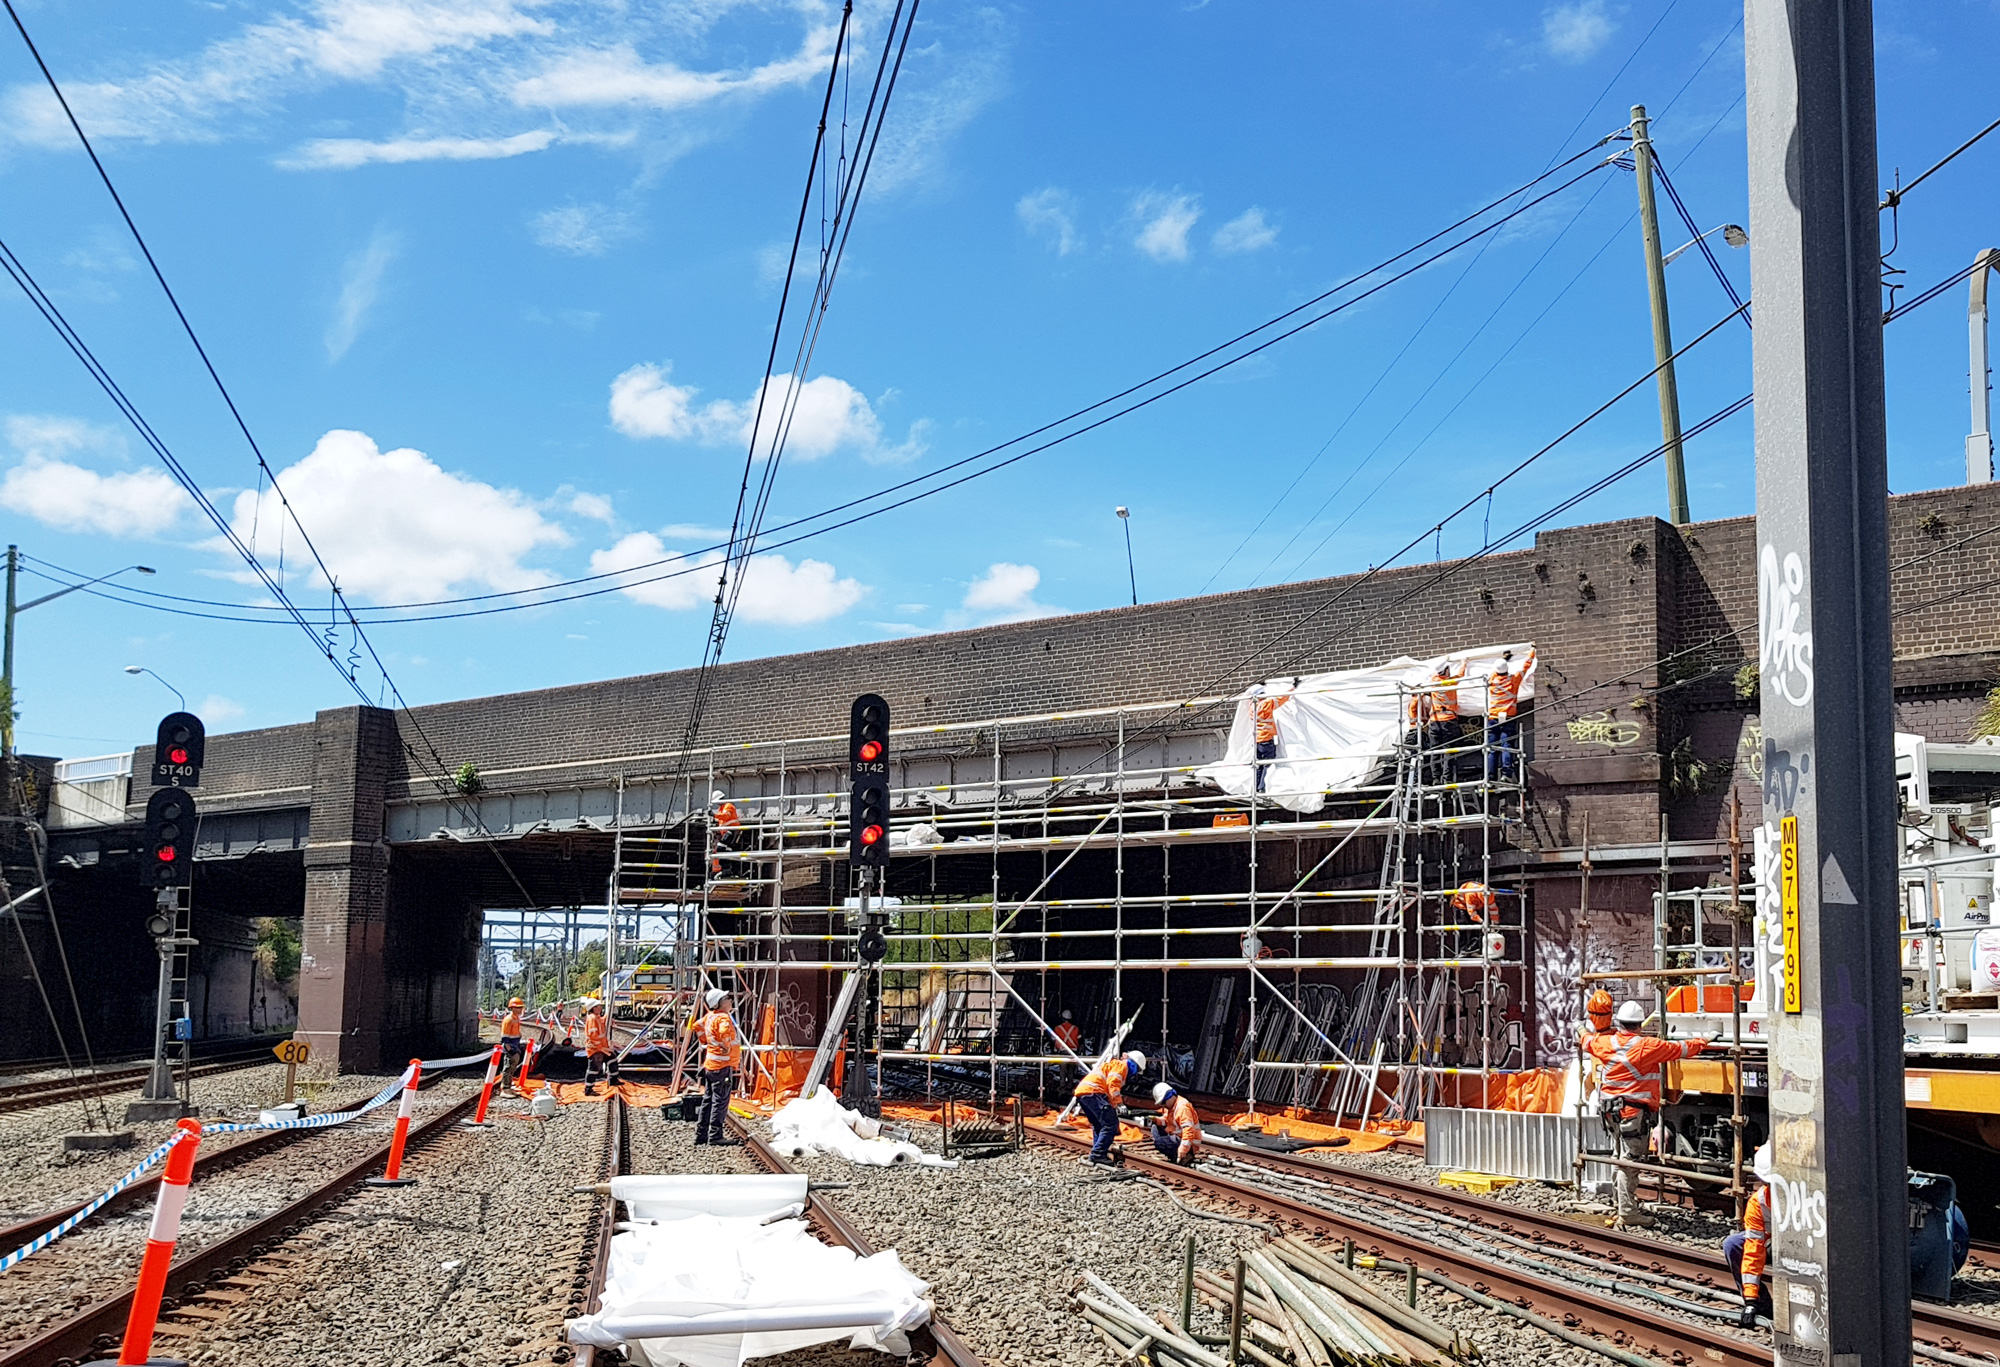 Sydney-Trains-Tempe-Station